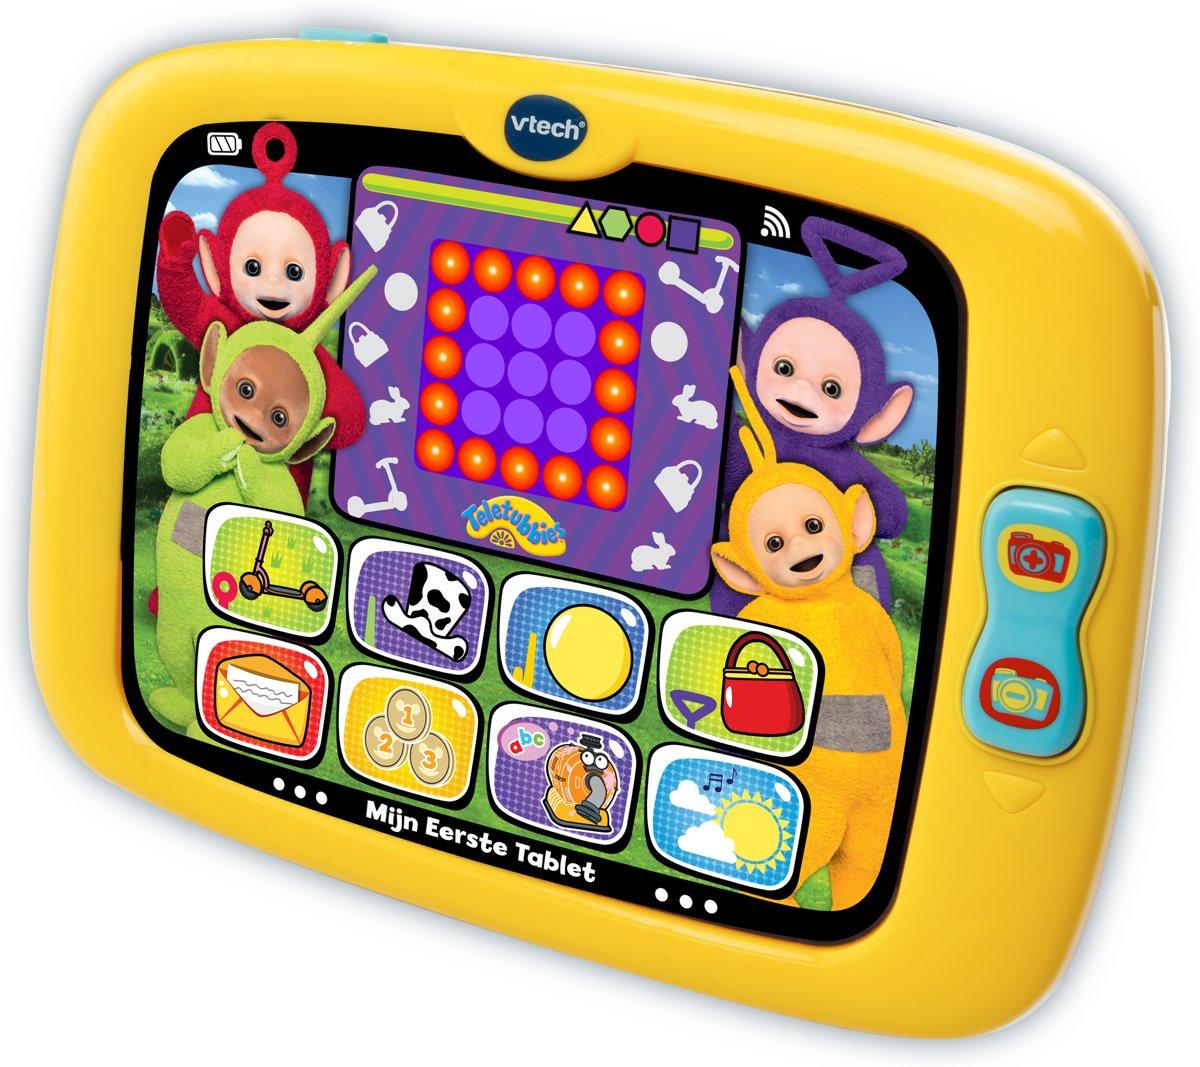 VTech Baby Teletubbies Tablet - Babytablet